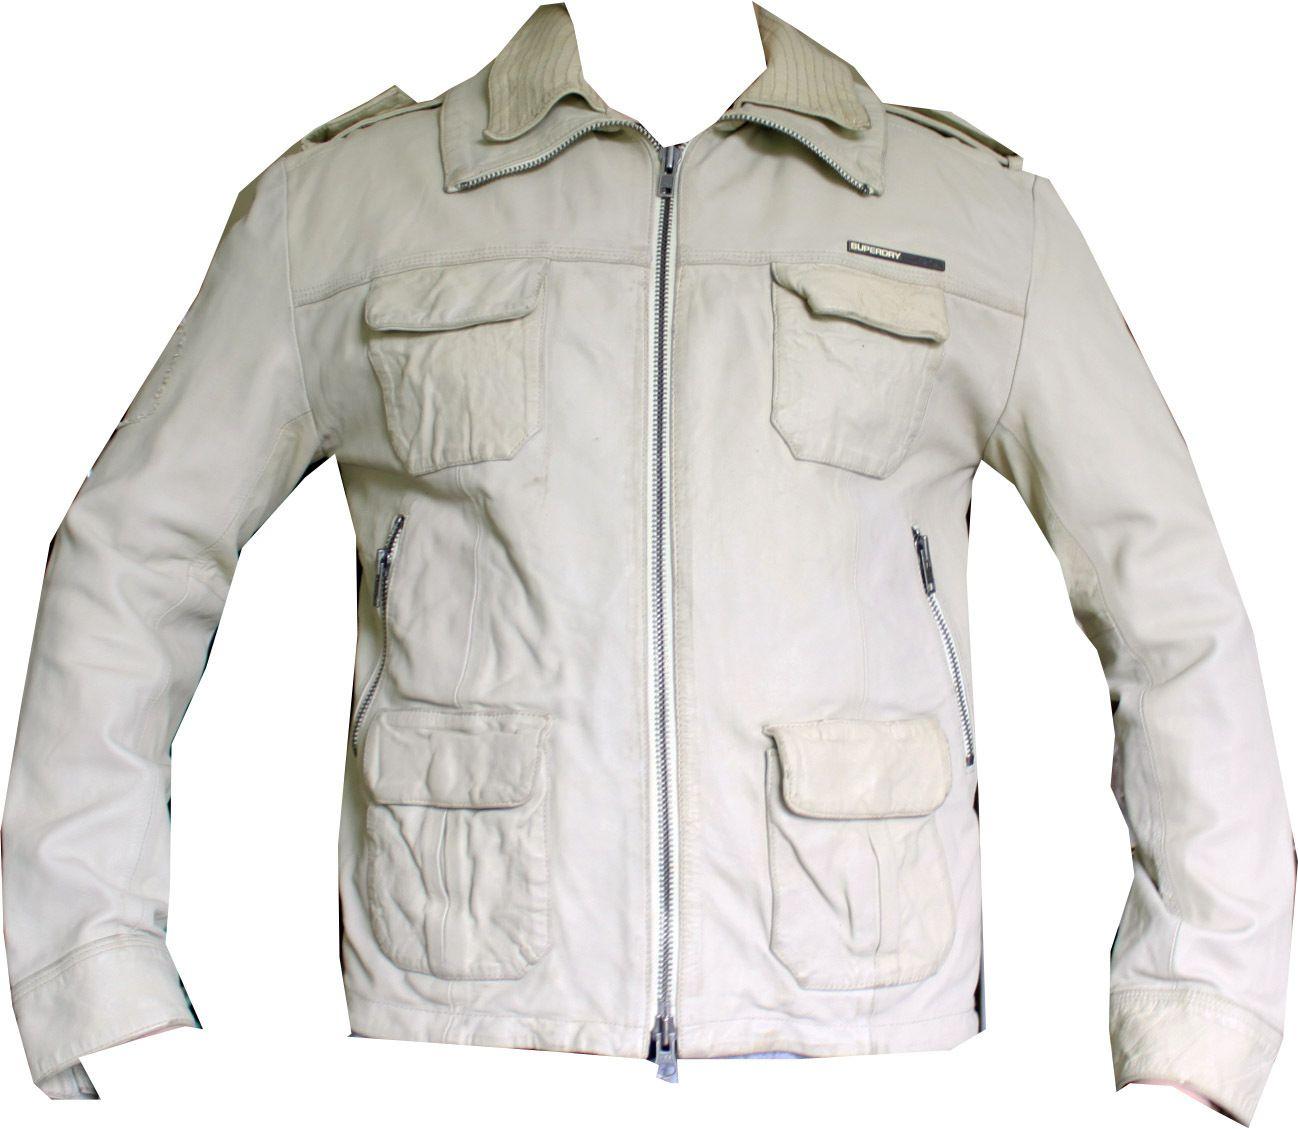 Pre Owned Designer Clothing   Superdry Jacket White Leather Biker Bomber Coat Men S Pre Owned